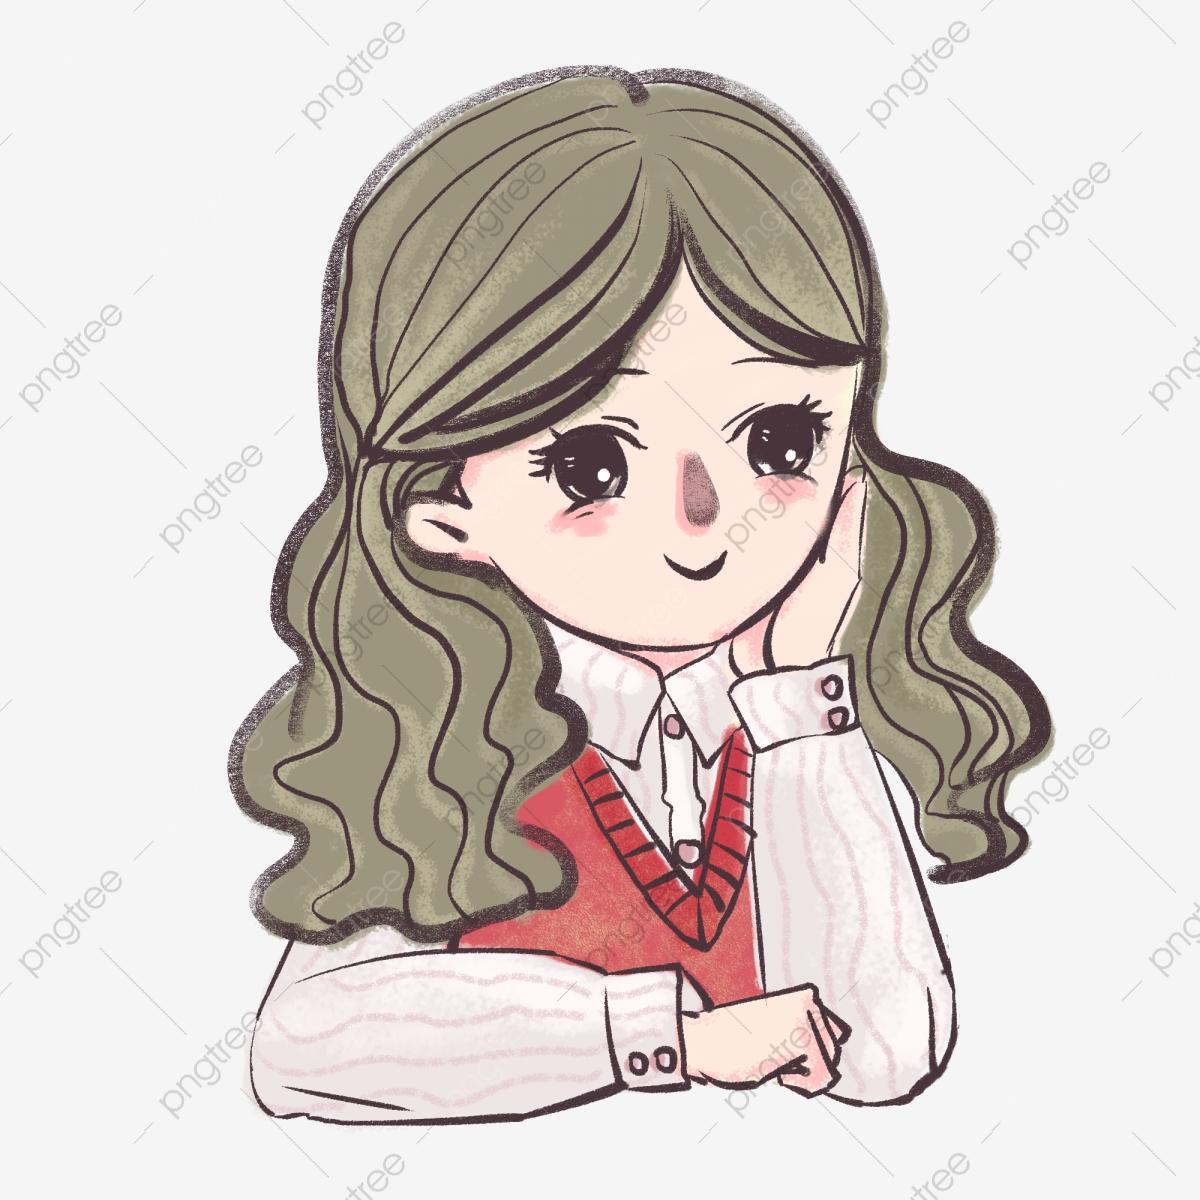 Beauty clipart beautiful lady. Japanese comics comic girl